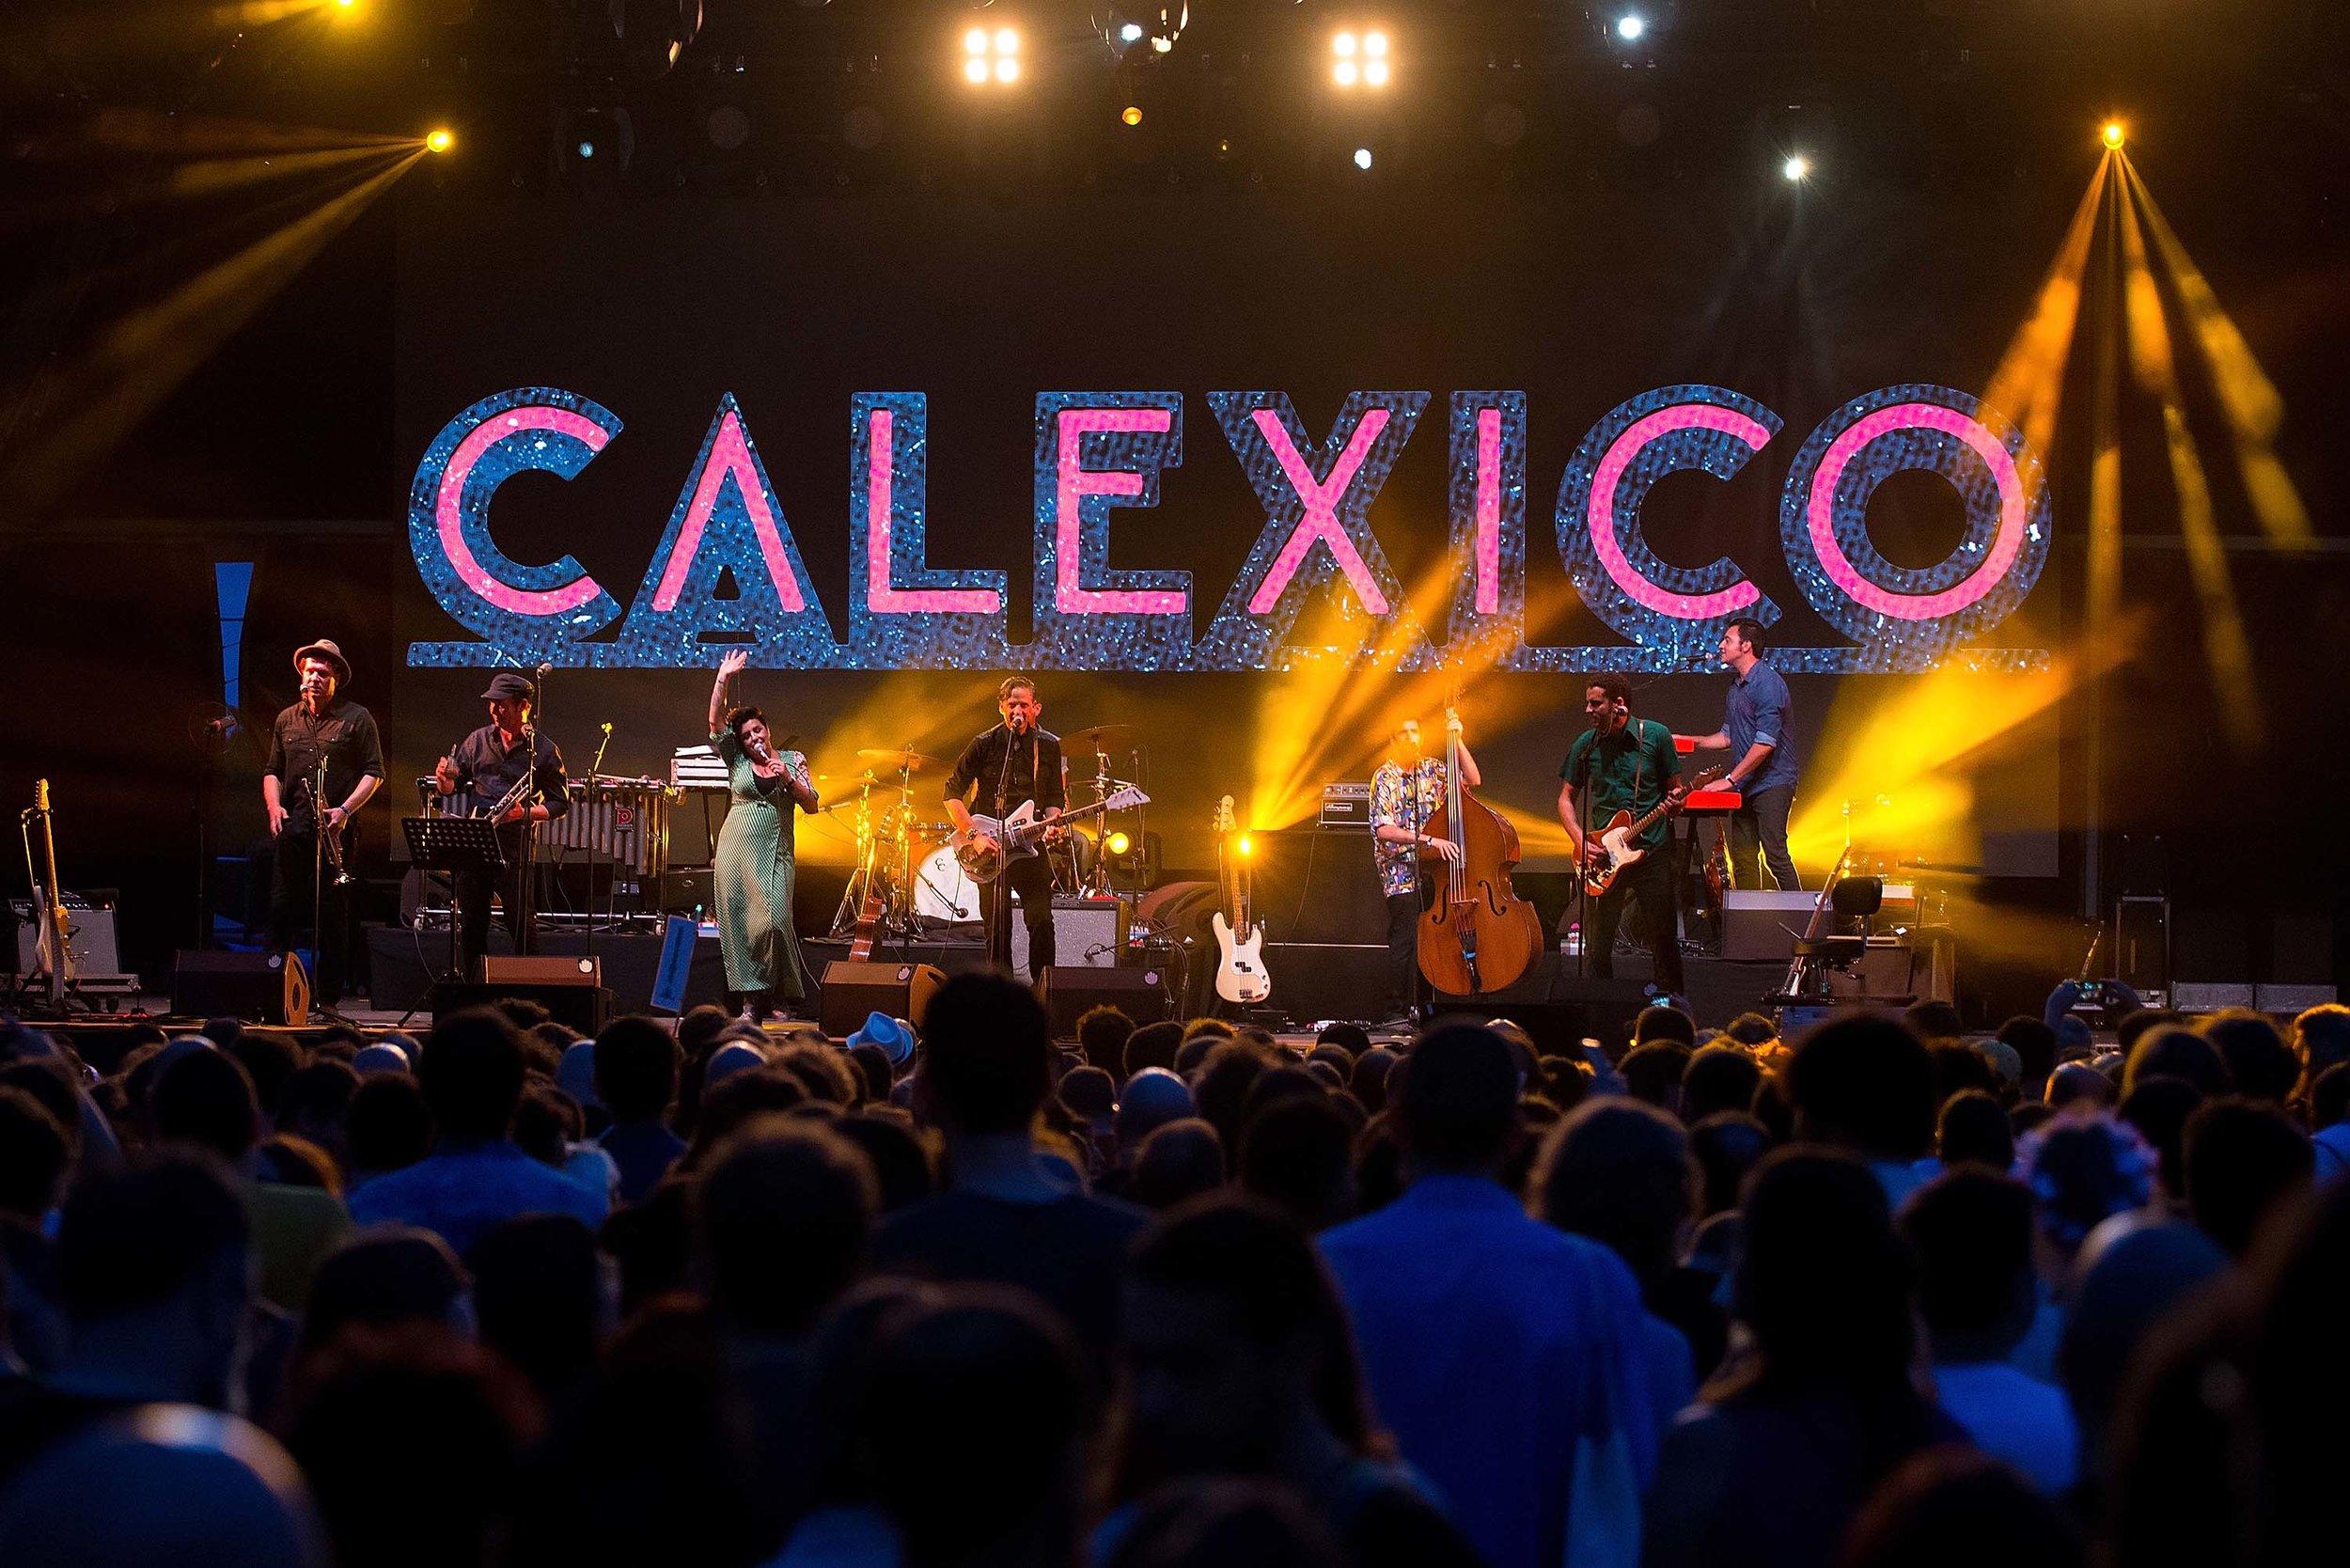 013 - CALEXICO - christian bertrand.jpg